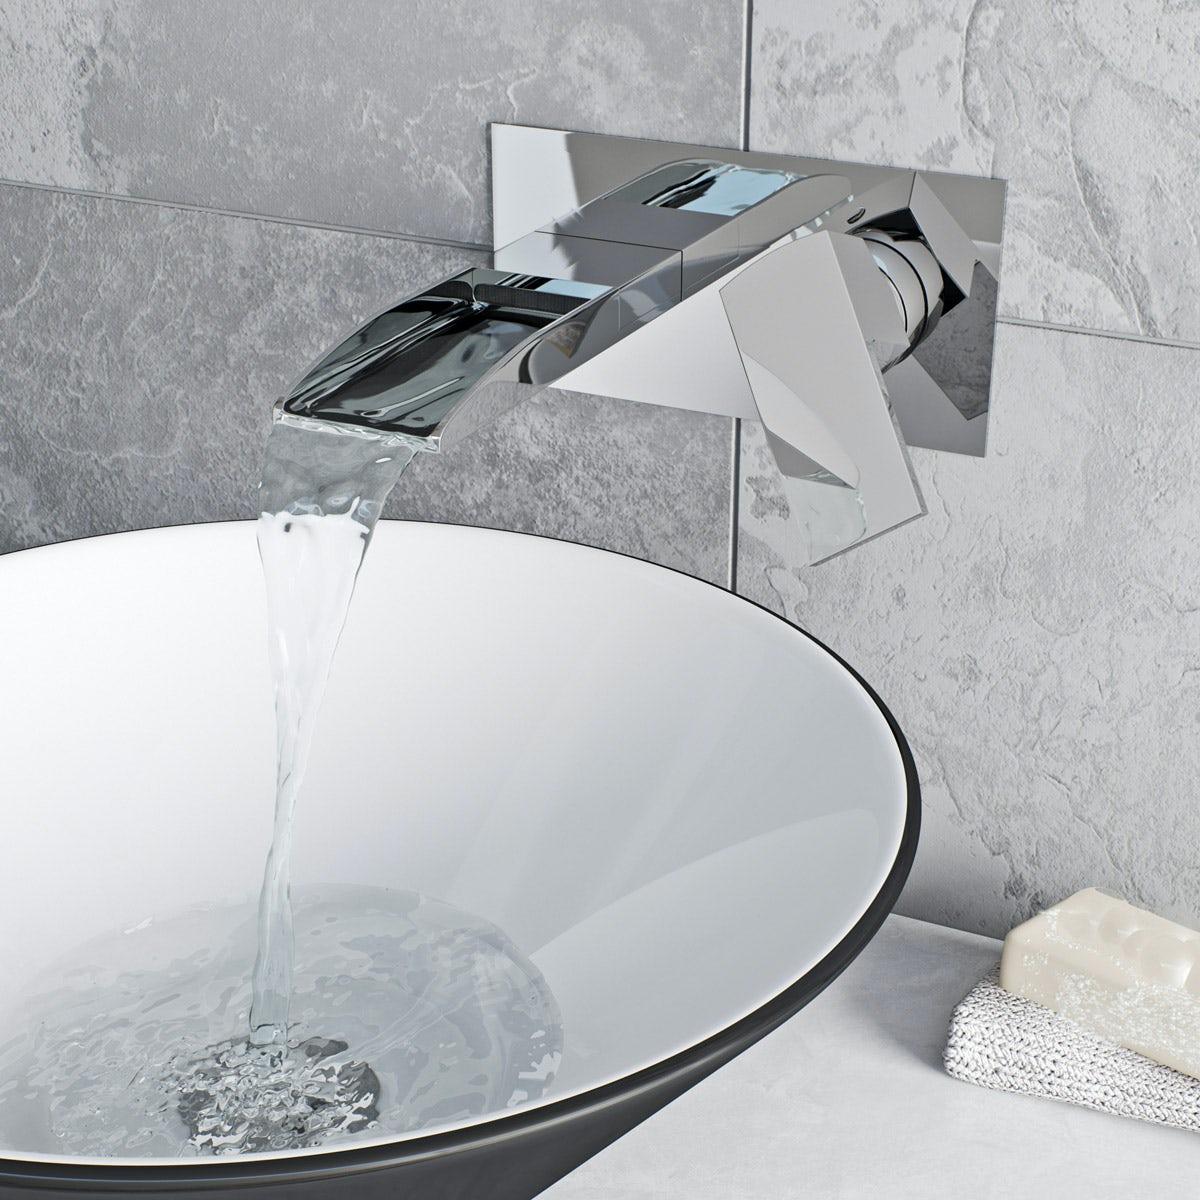 Erskine wall mounted waterfall basin mixer tap